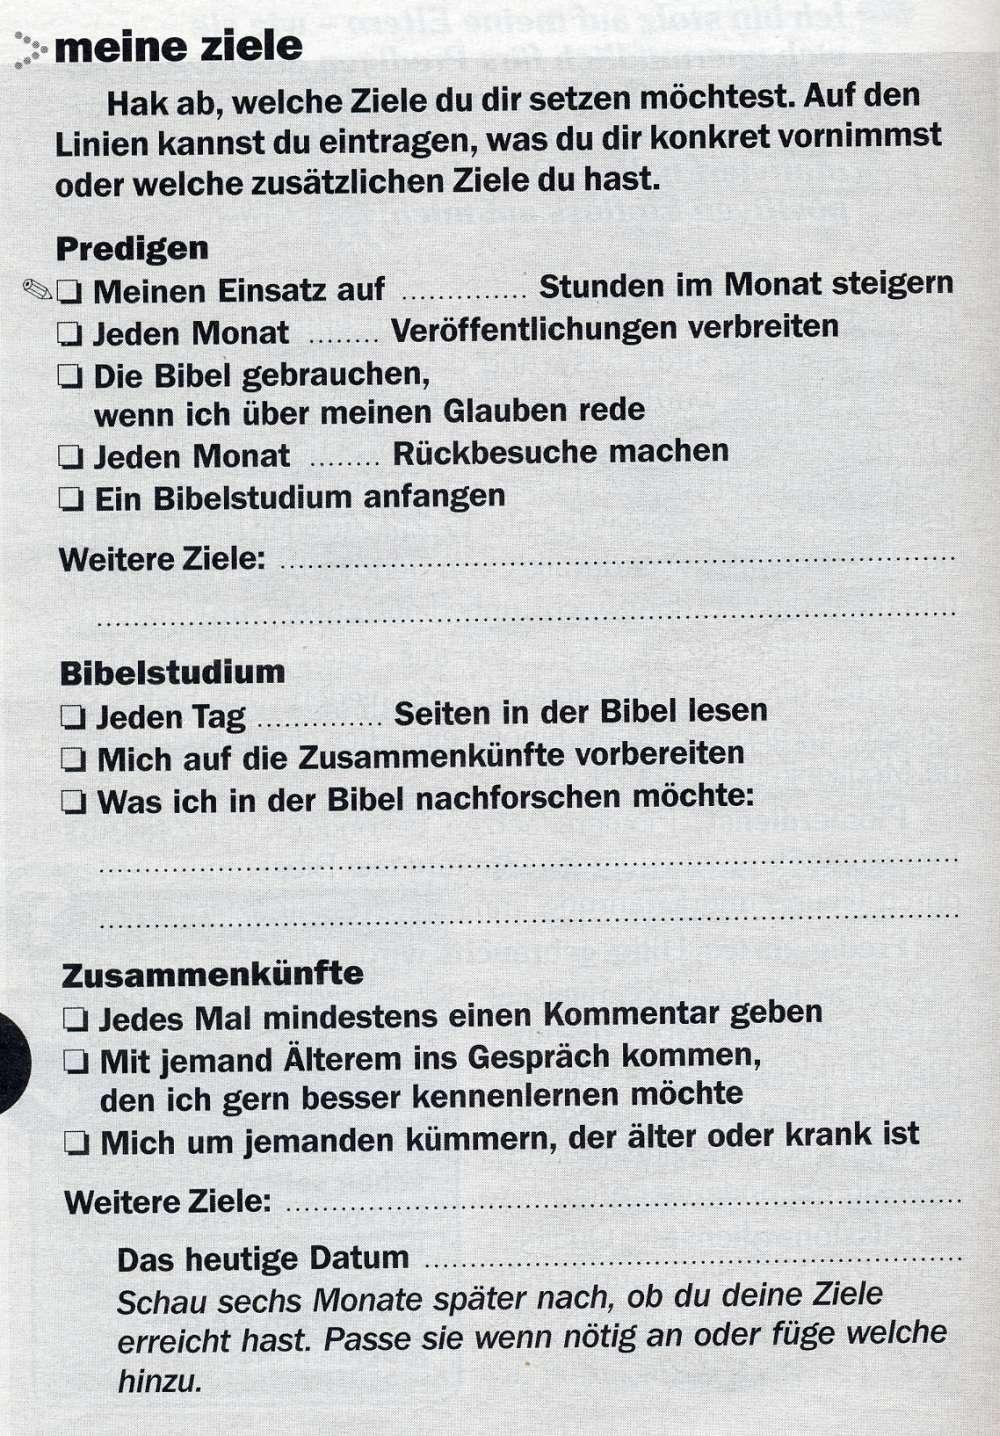 picture: http://www.manfred-gebhard.de/PFile0042.jpg